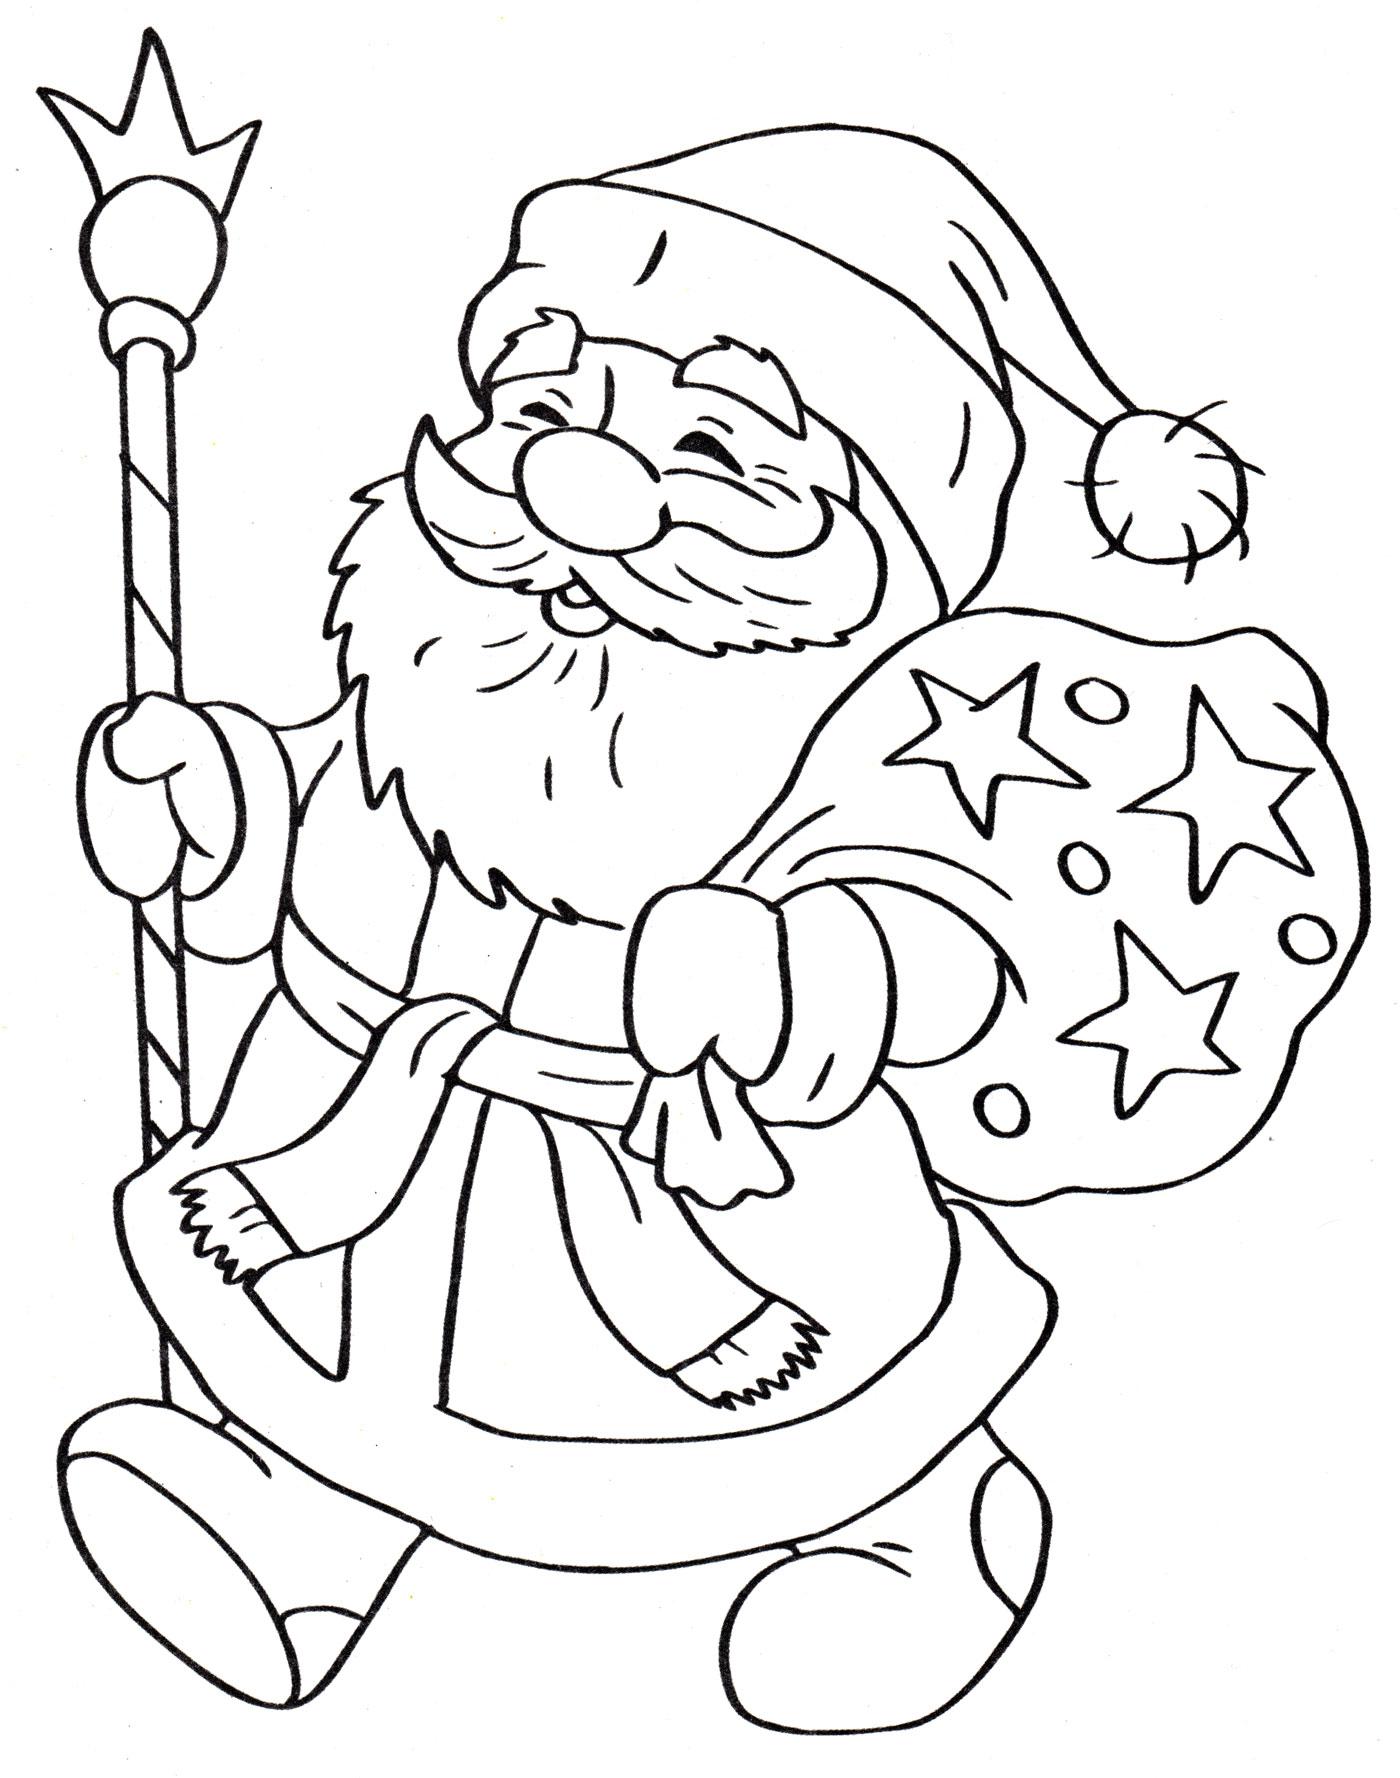 Раскраска Дед мороз с подарками